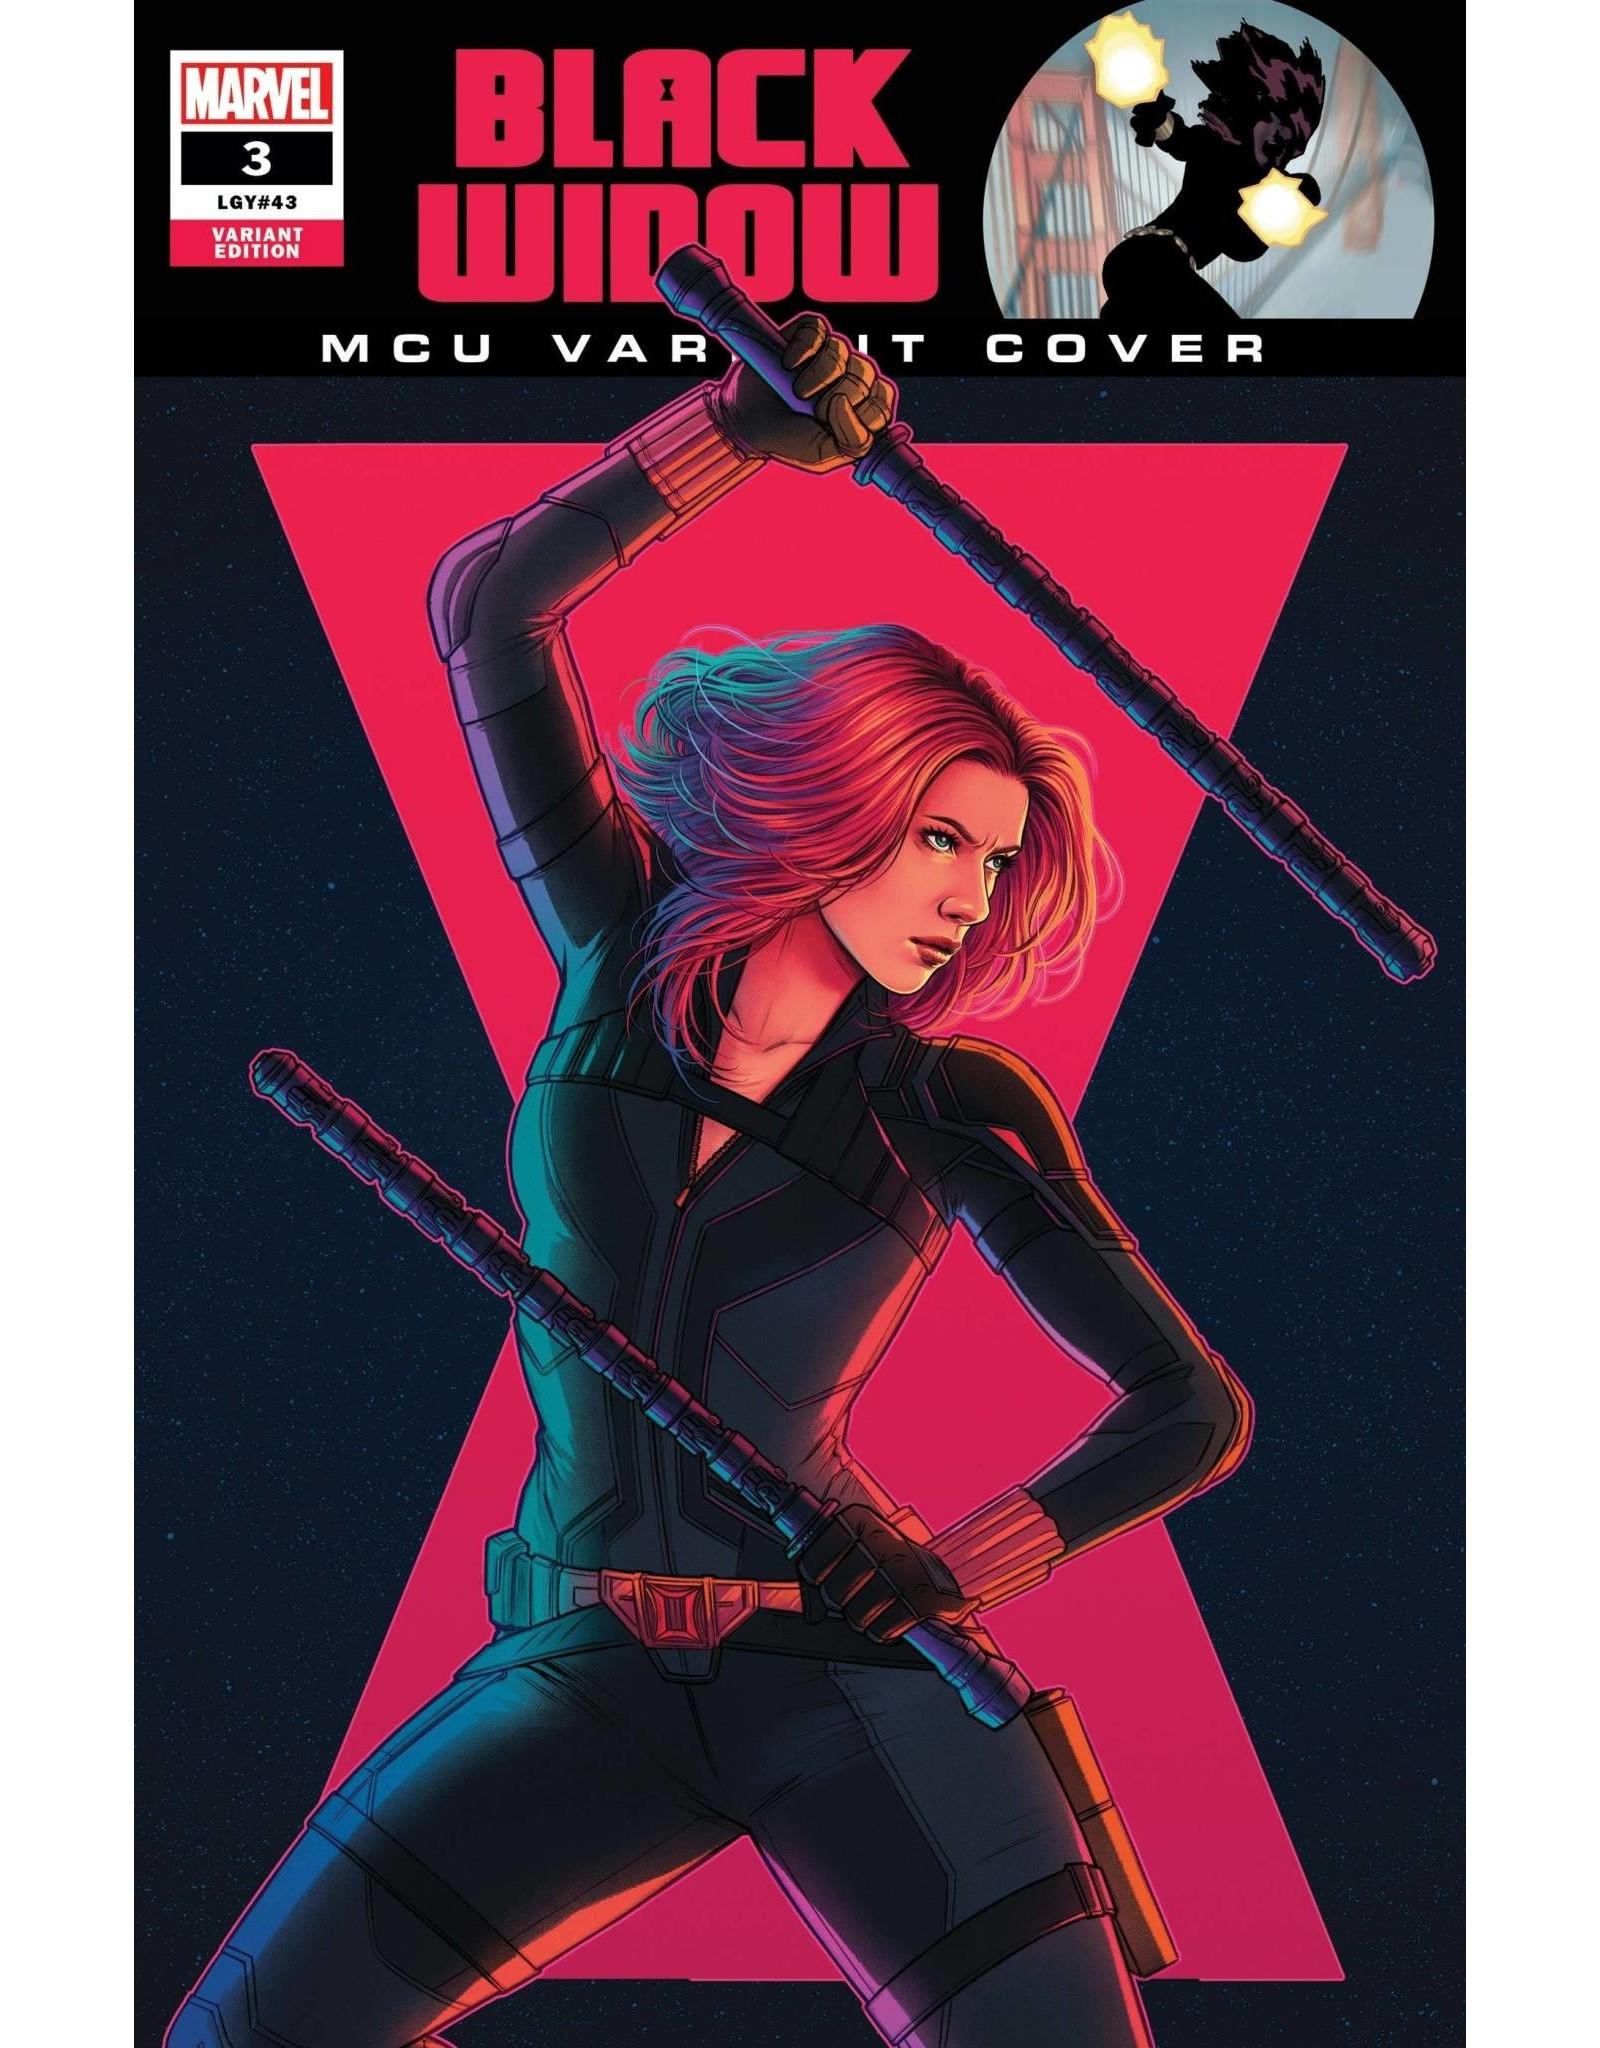 Marvel Comics BLACK WIDOW #3 BARTEL MCU VAR